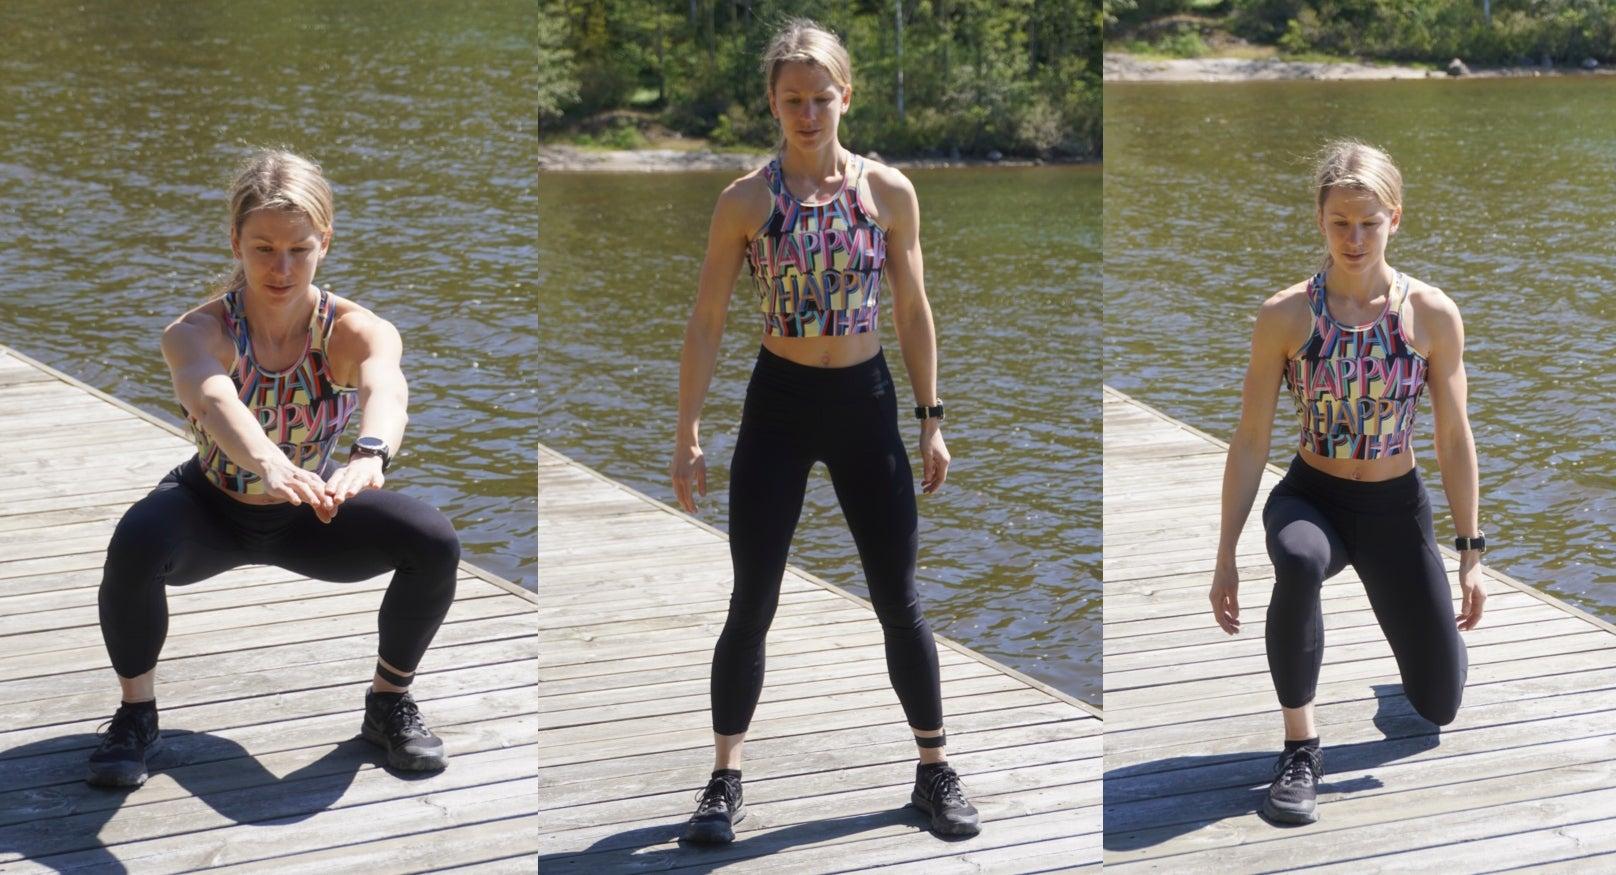 Sumo Squat to Lunge Exercise